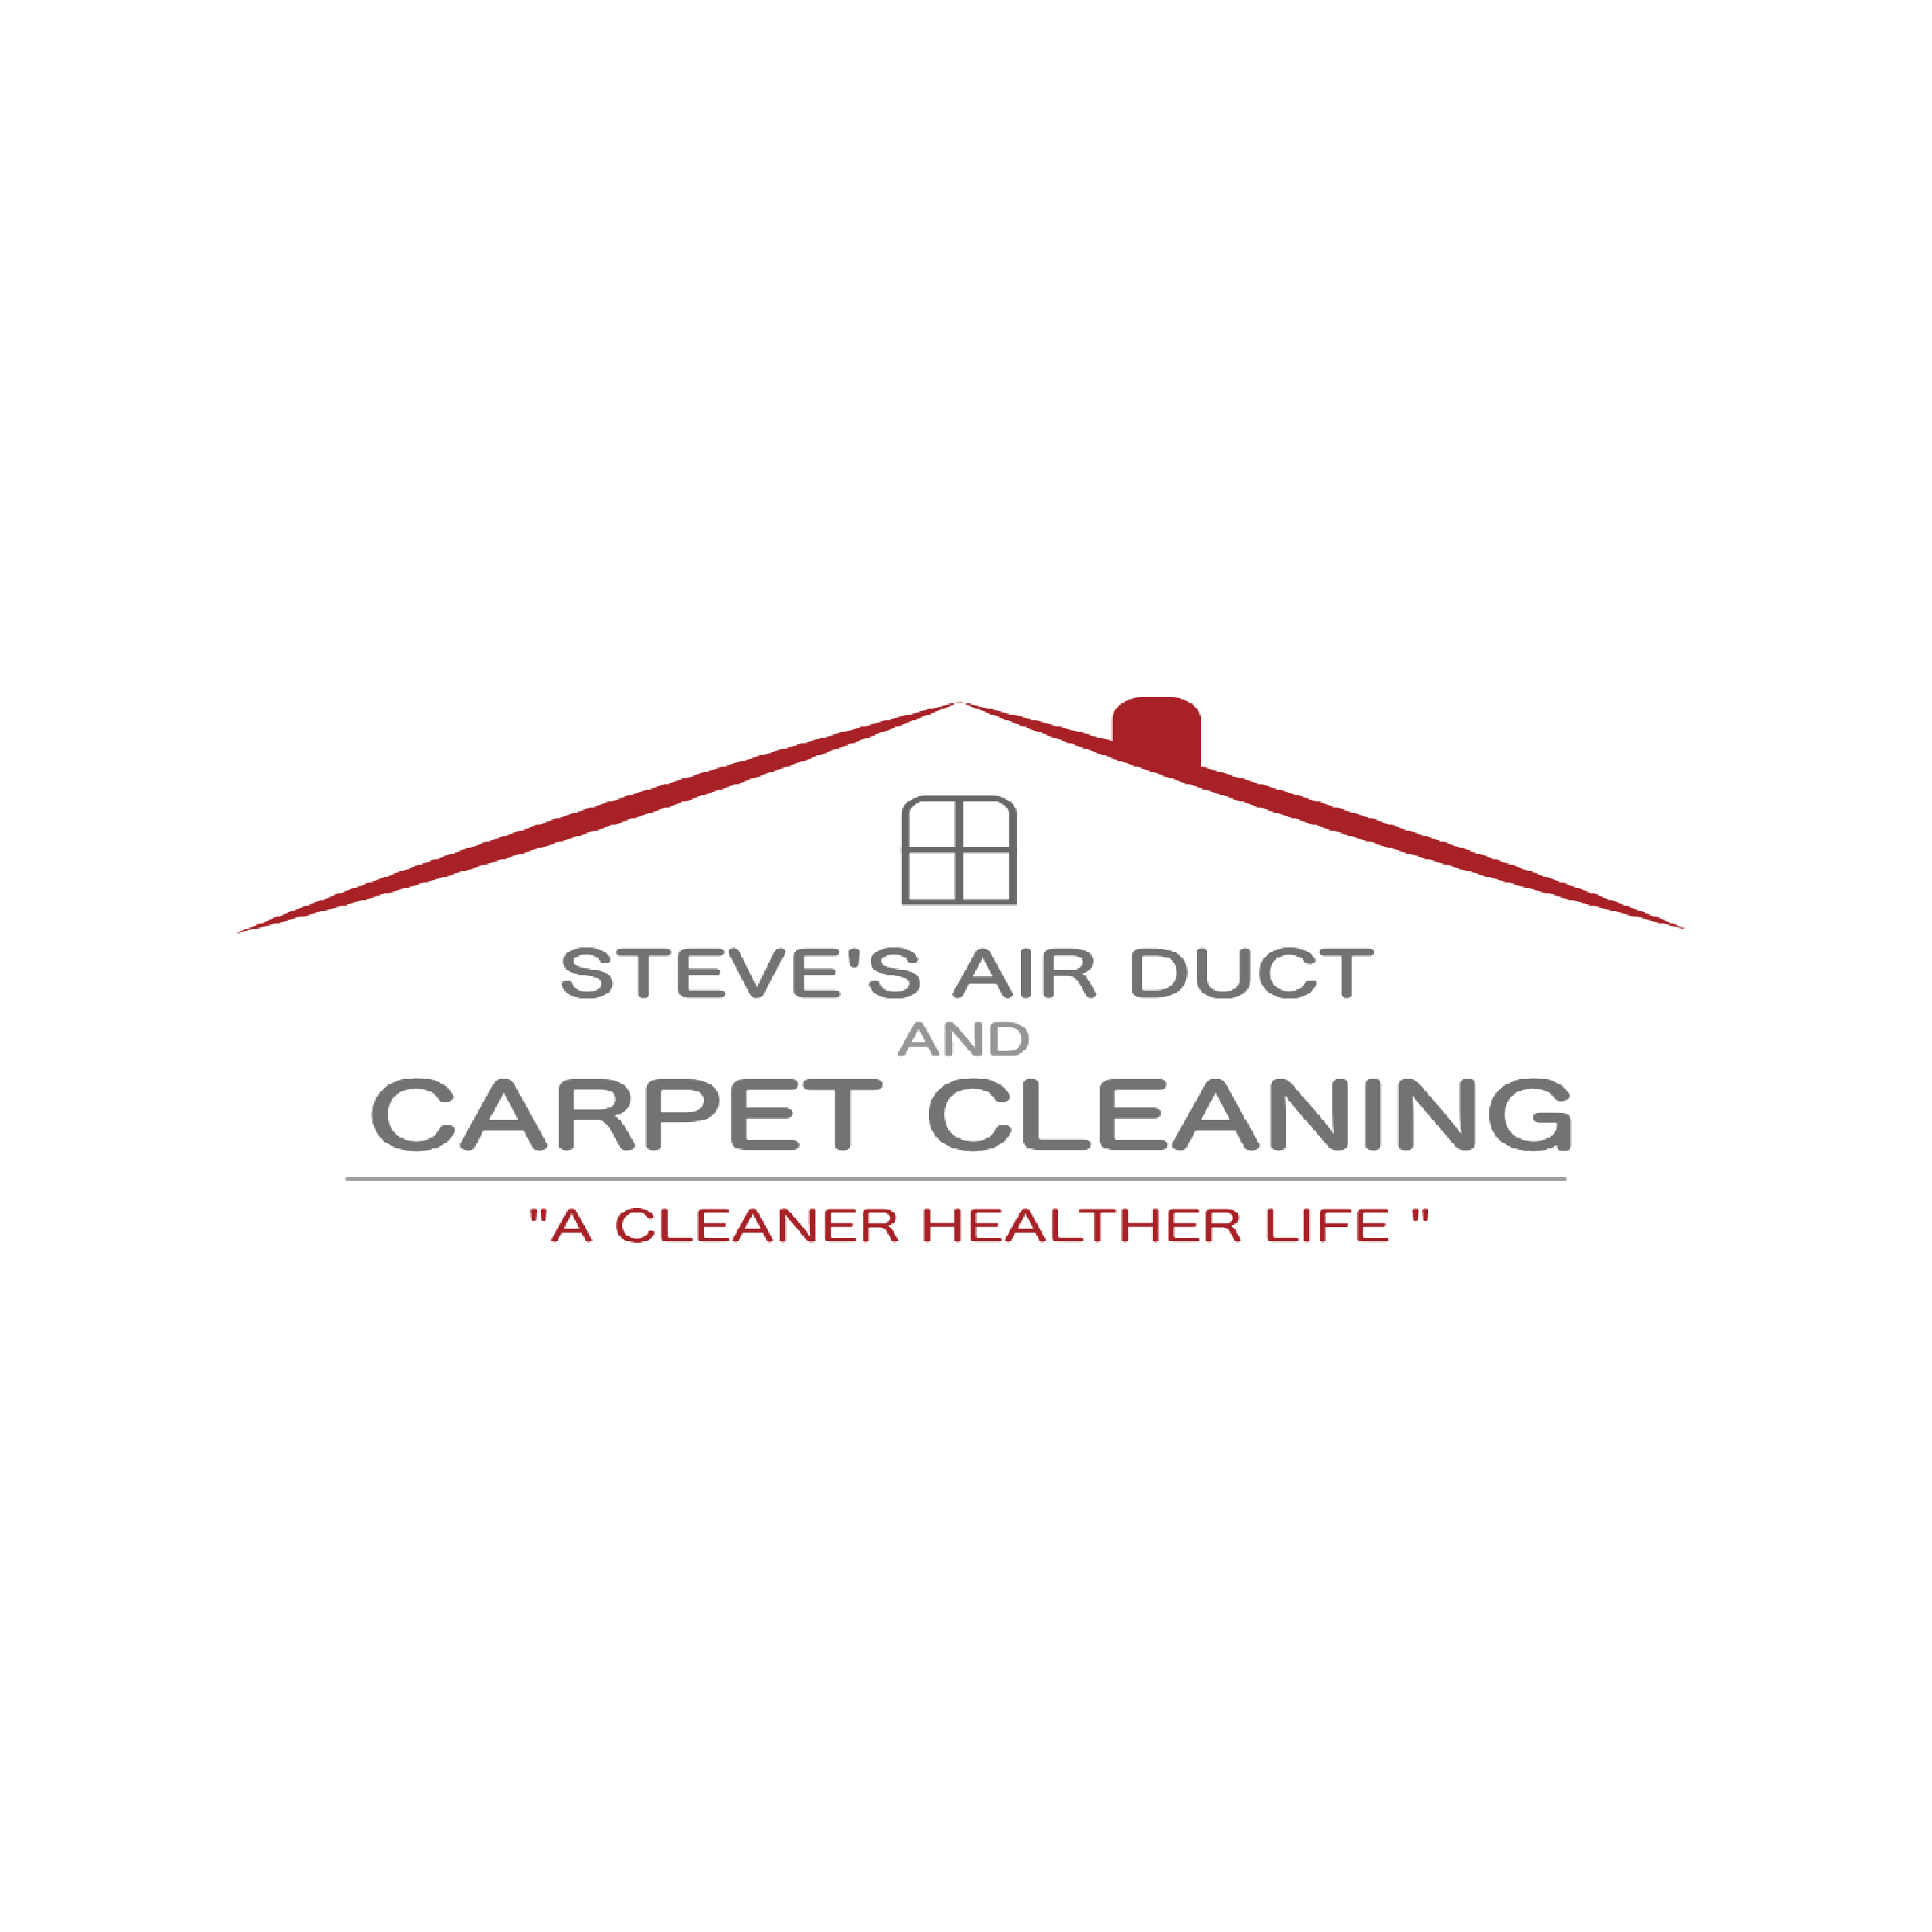 Steves Air Duct Carpet Cleaning Ann Arbor